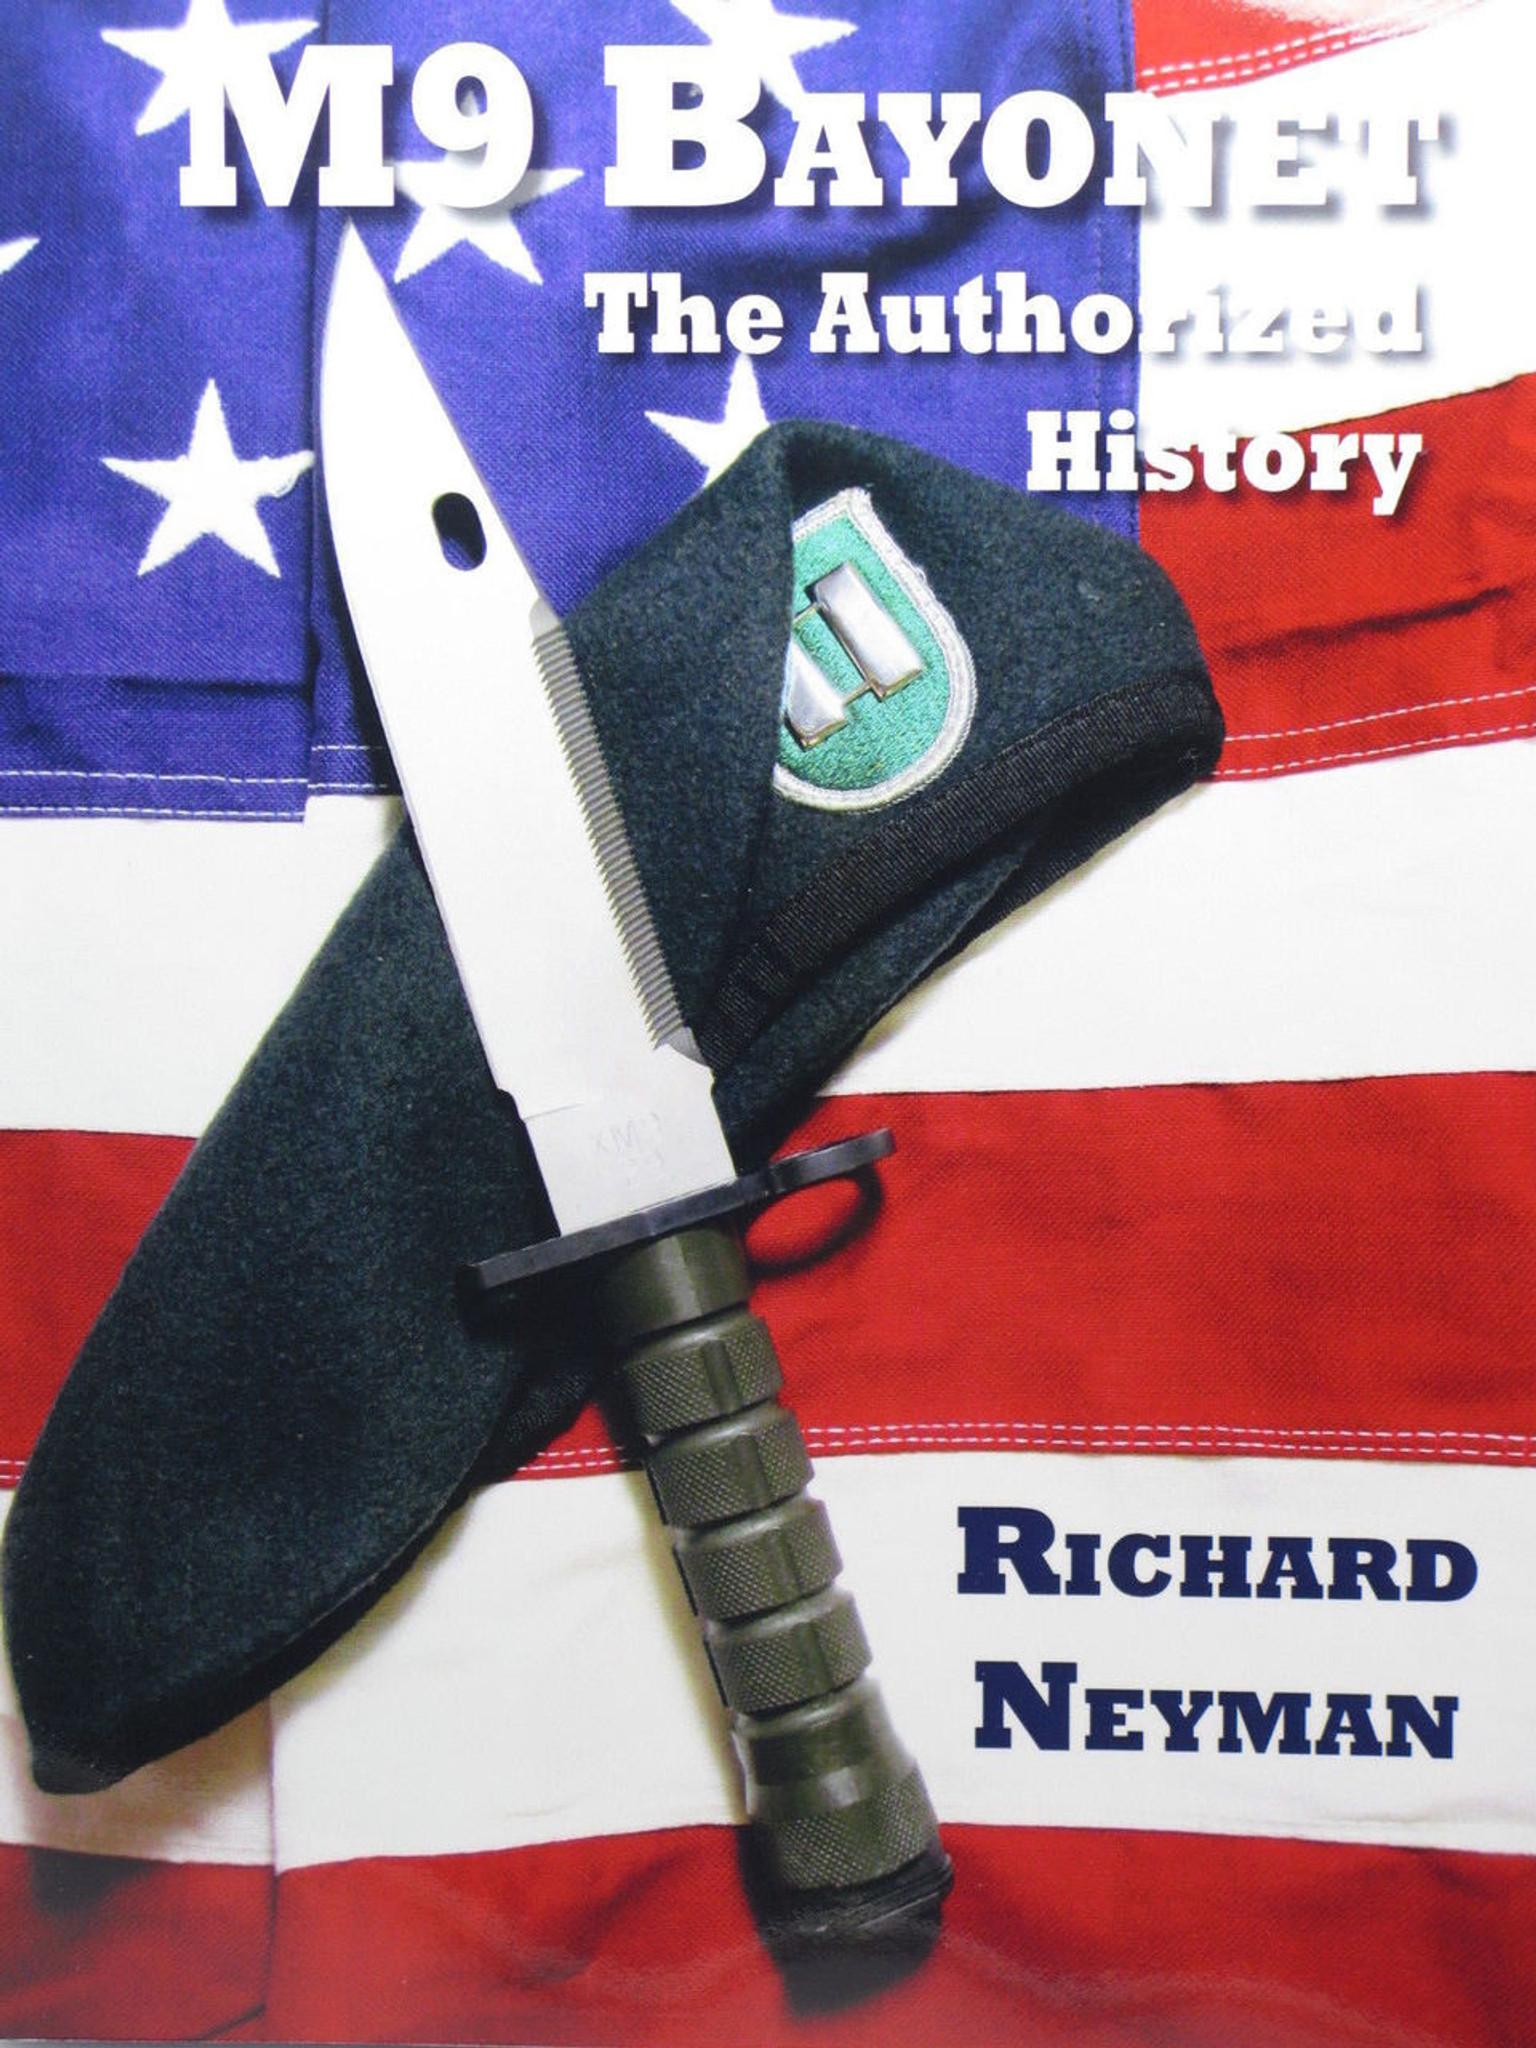 M9 Bayonet: The Authorized History, by Richard Neyman